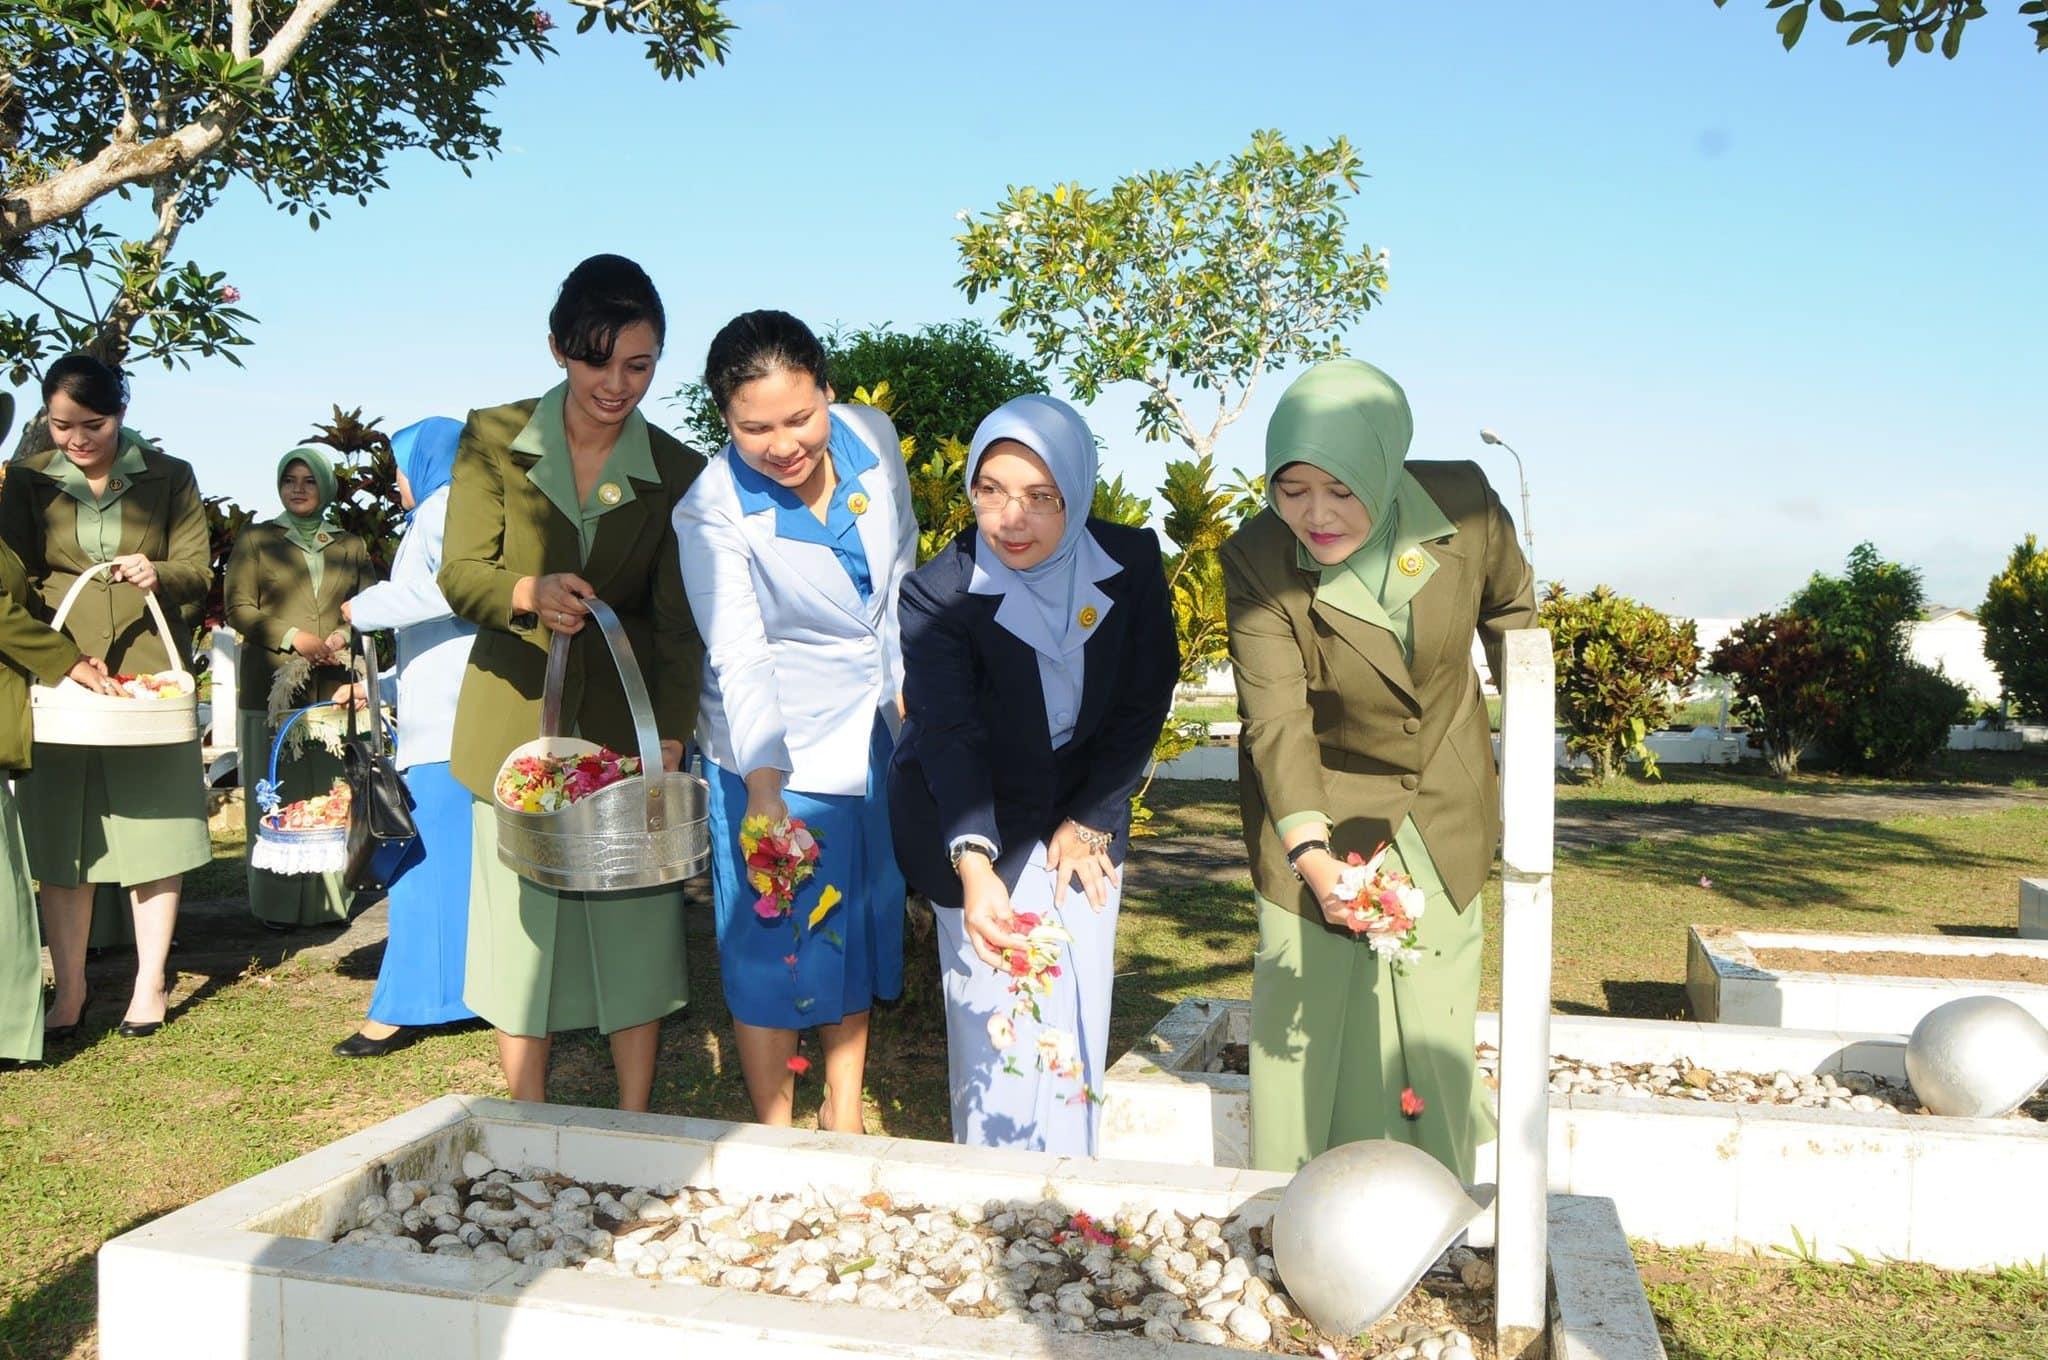 HUT ke 68 Persit KCK PD XII/Tpr Ziarah ke Makam Pahlawan Dharma Patria Jaya